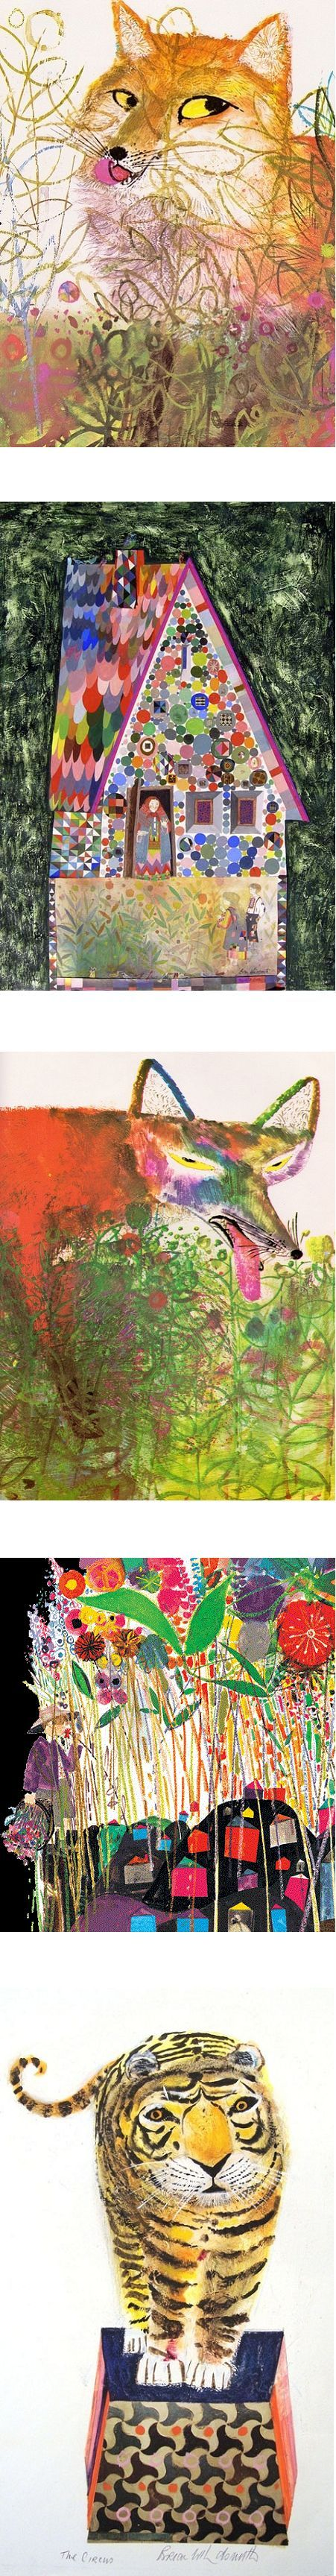 Illustrations by Brian Wildsmith-xx tracy porter. poetic wanderlust